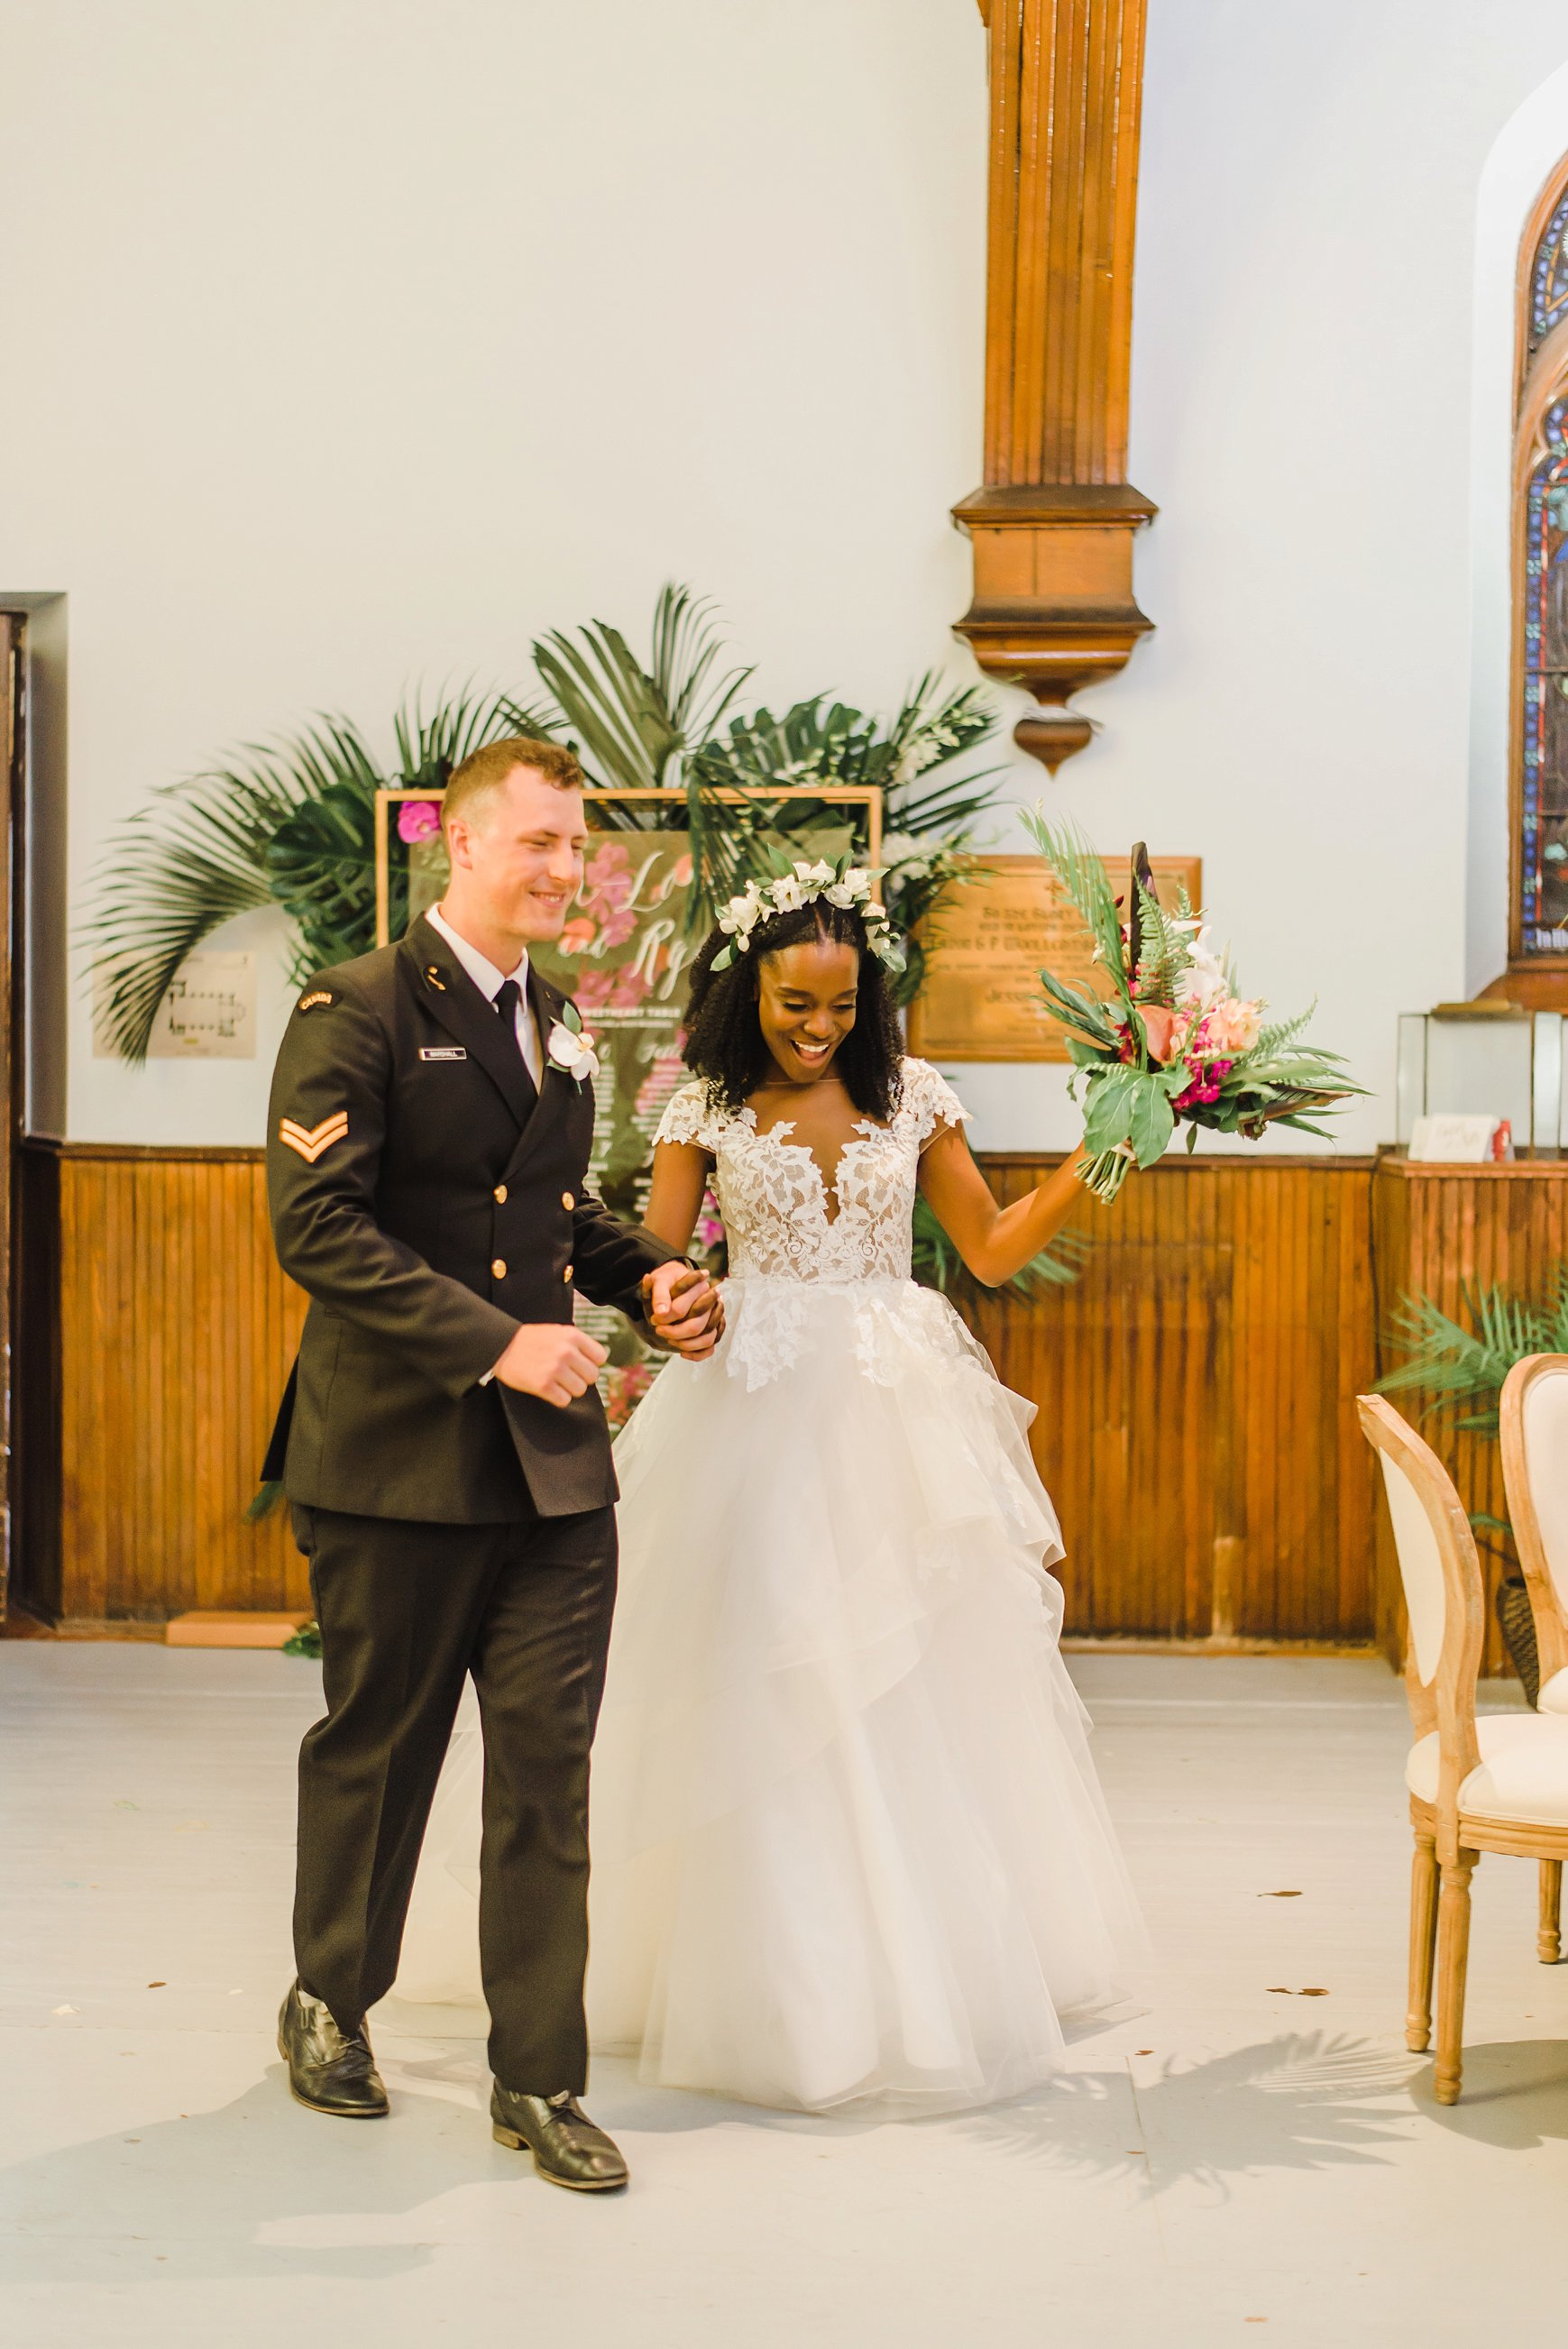 light airy indie fine art ottawa wedding photographer | Ali and Batoul Photography_1030.jpg